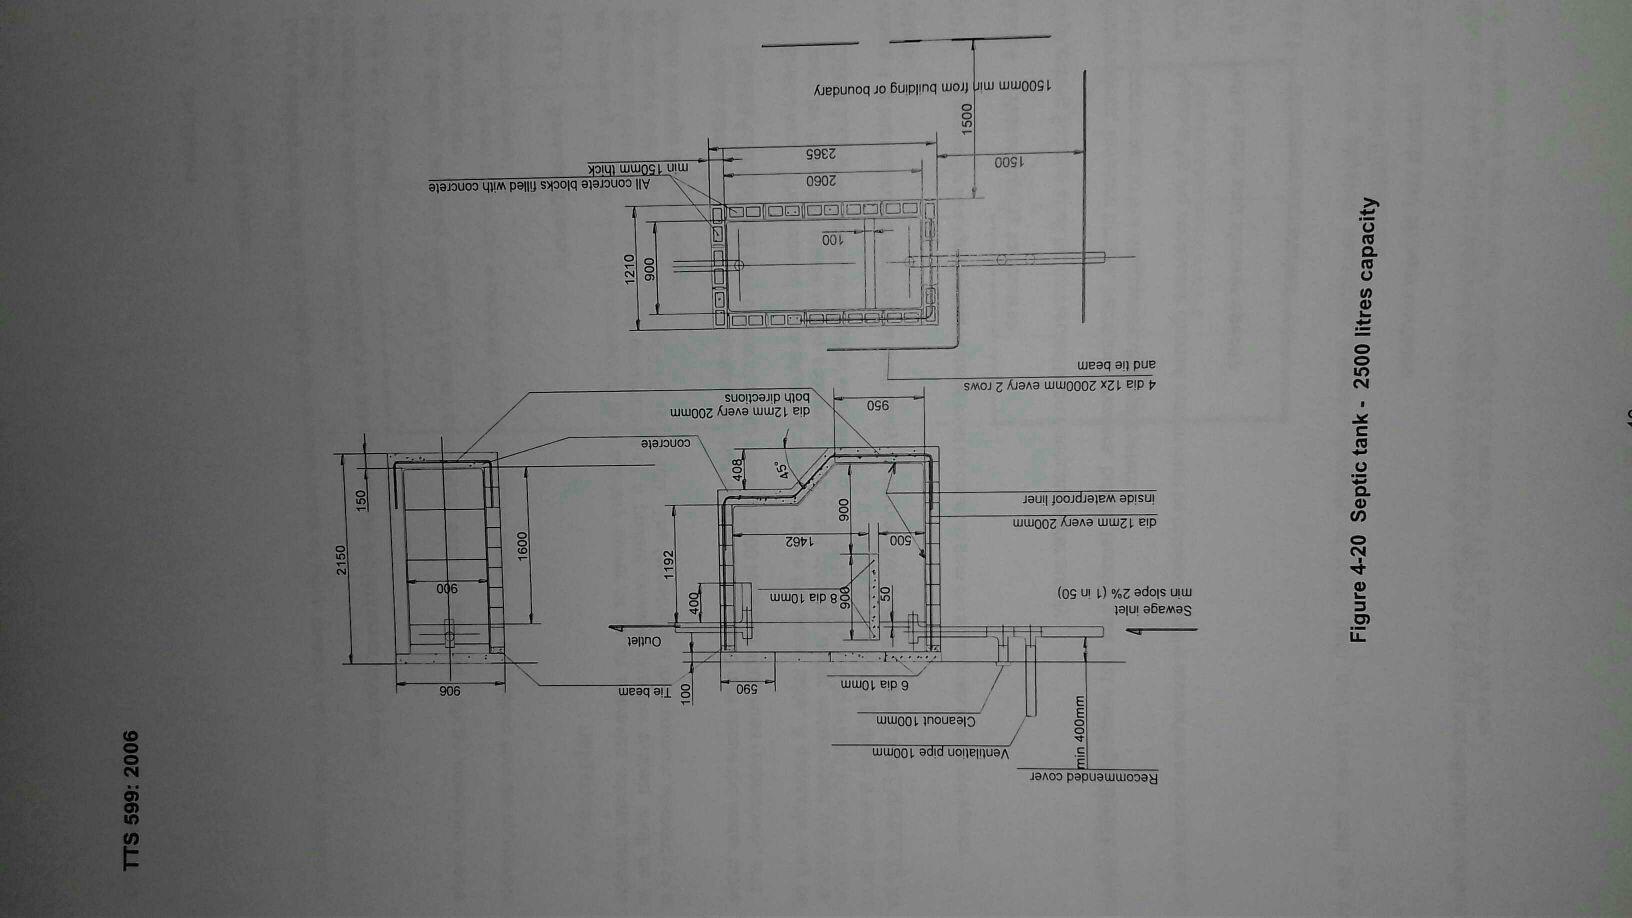 My DIY house Build    - Page 5- trinituner com